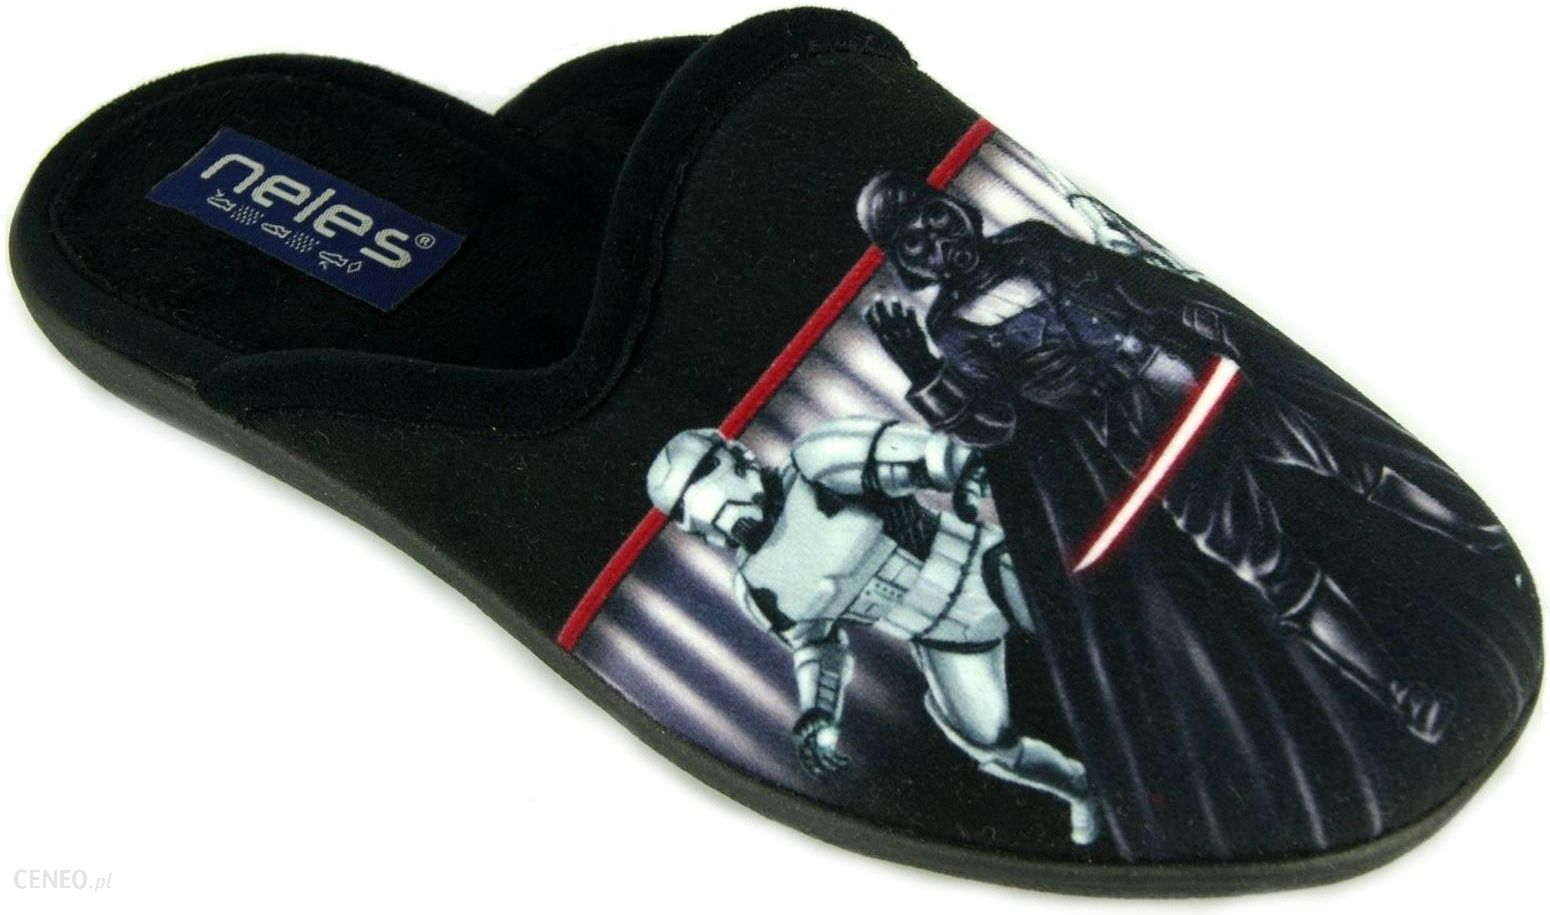 96a3d411c0599 Neles 4724.469 Star Wars Pantofle Neles 4724.469 Star Wars - Ceny i ...